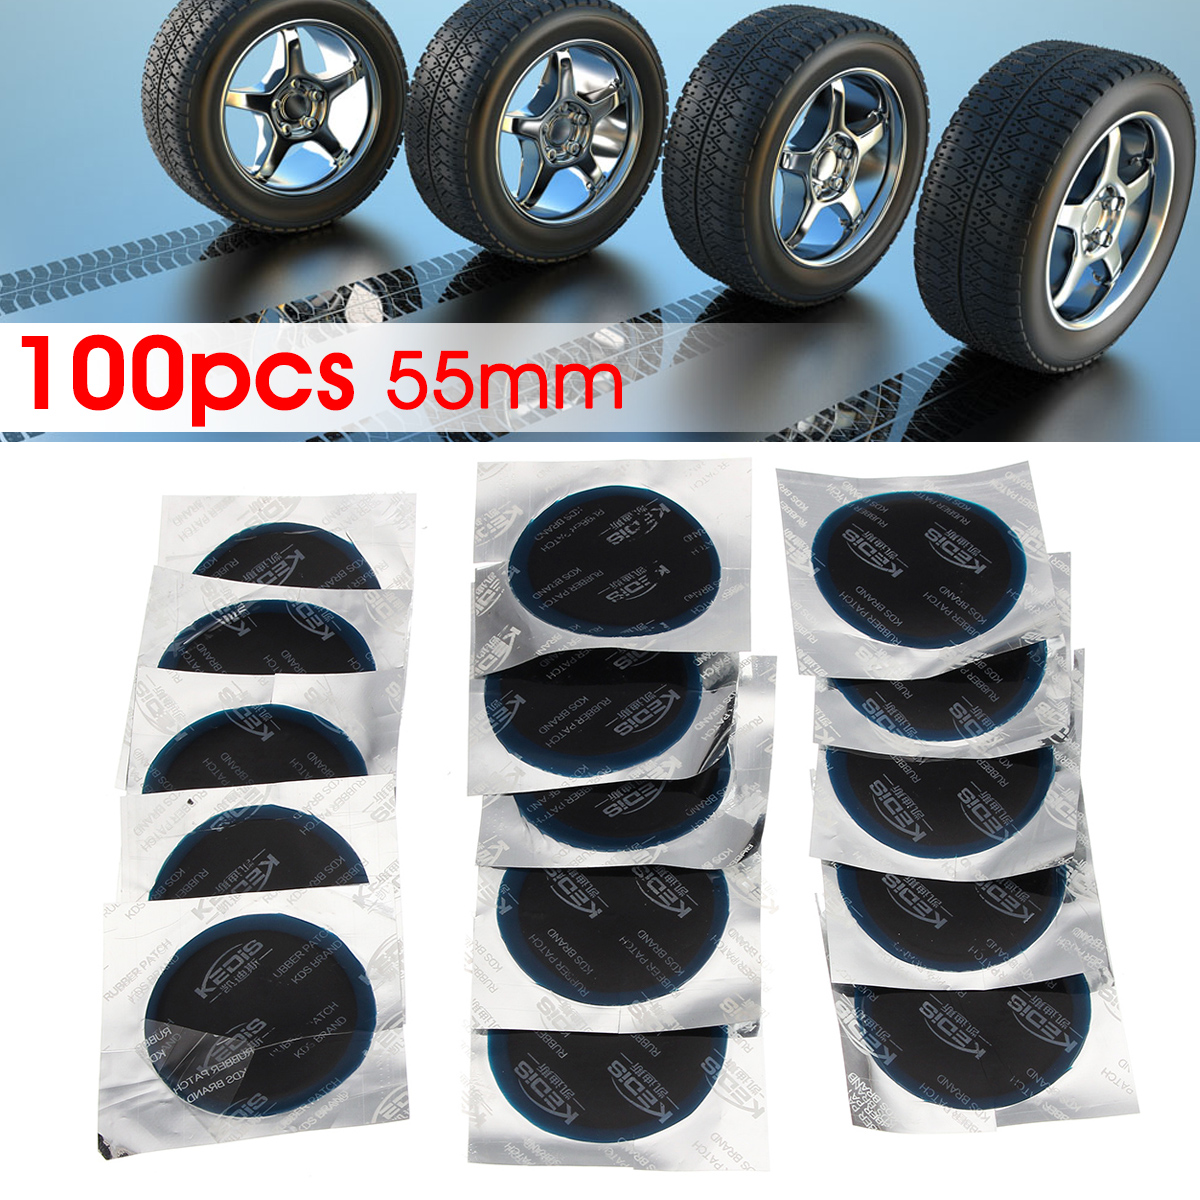 100pcs Car Radial Tire Repair Round Patch Tubeless Tool Medium 55mm 2.17''